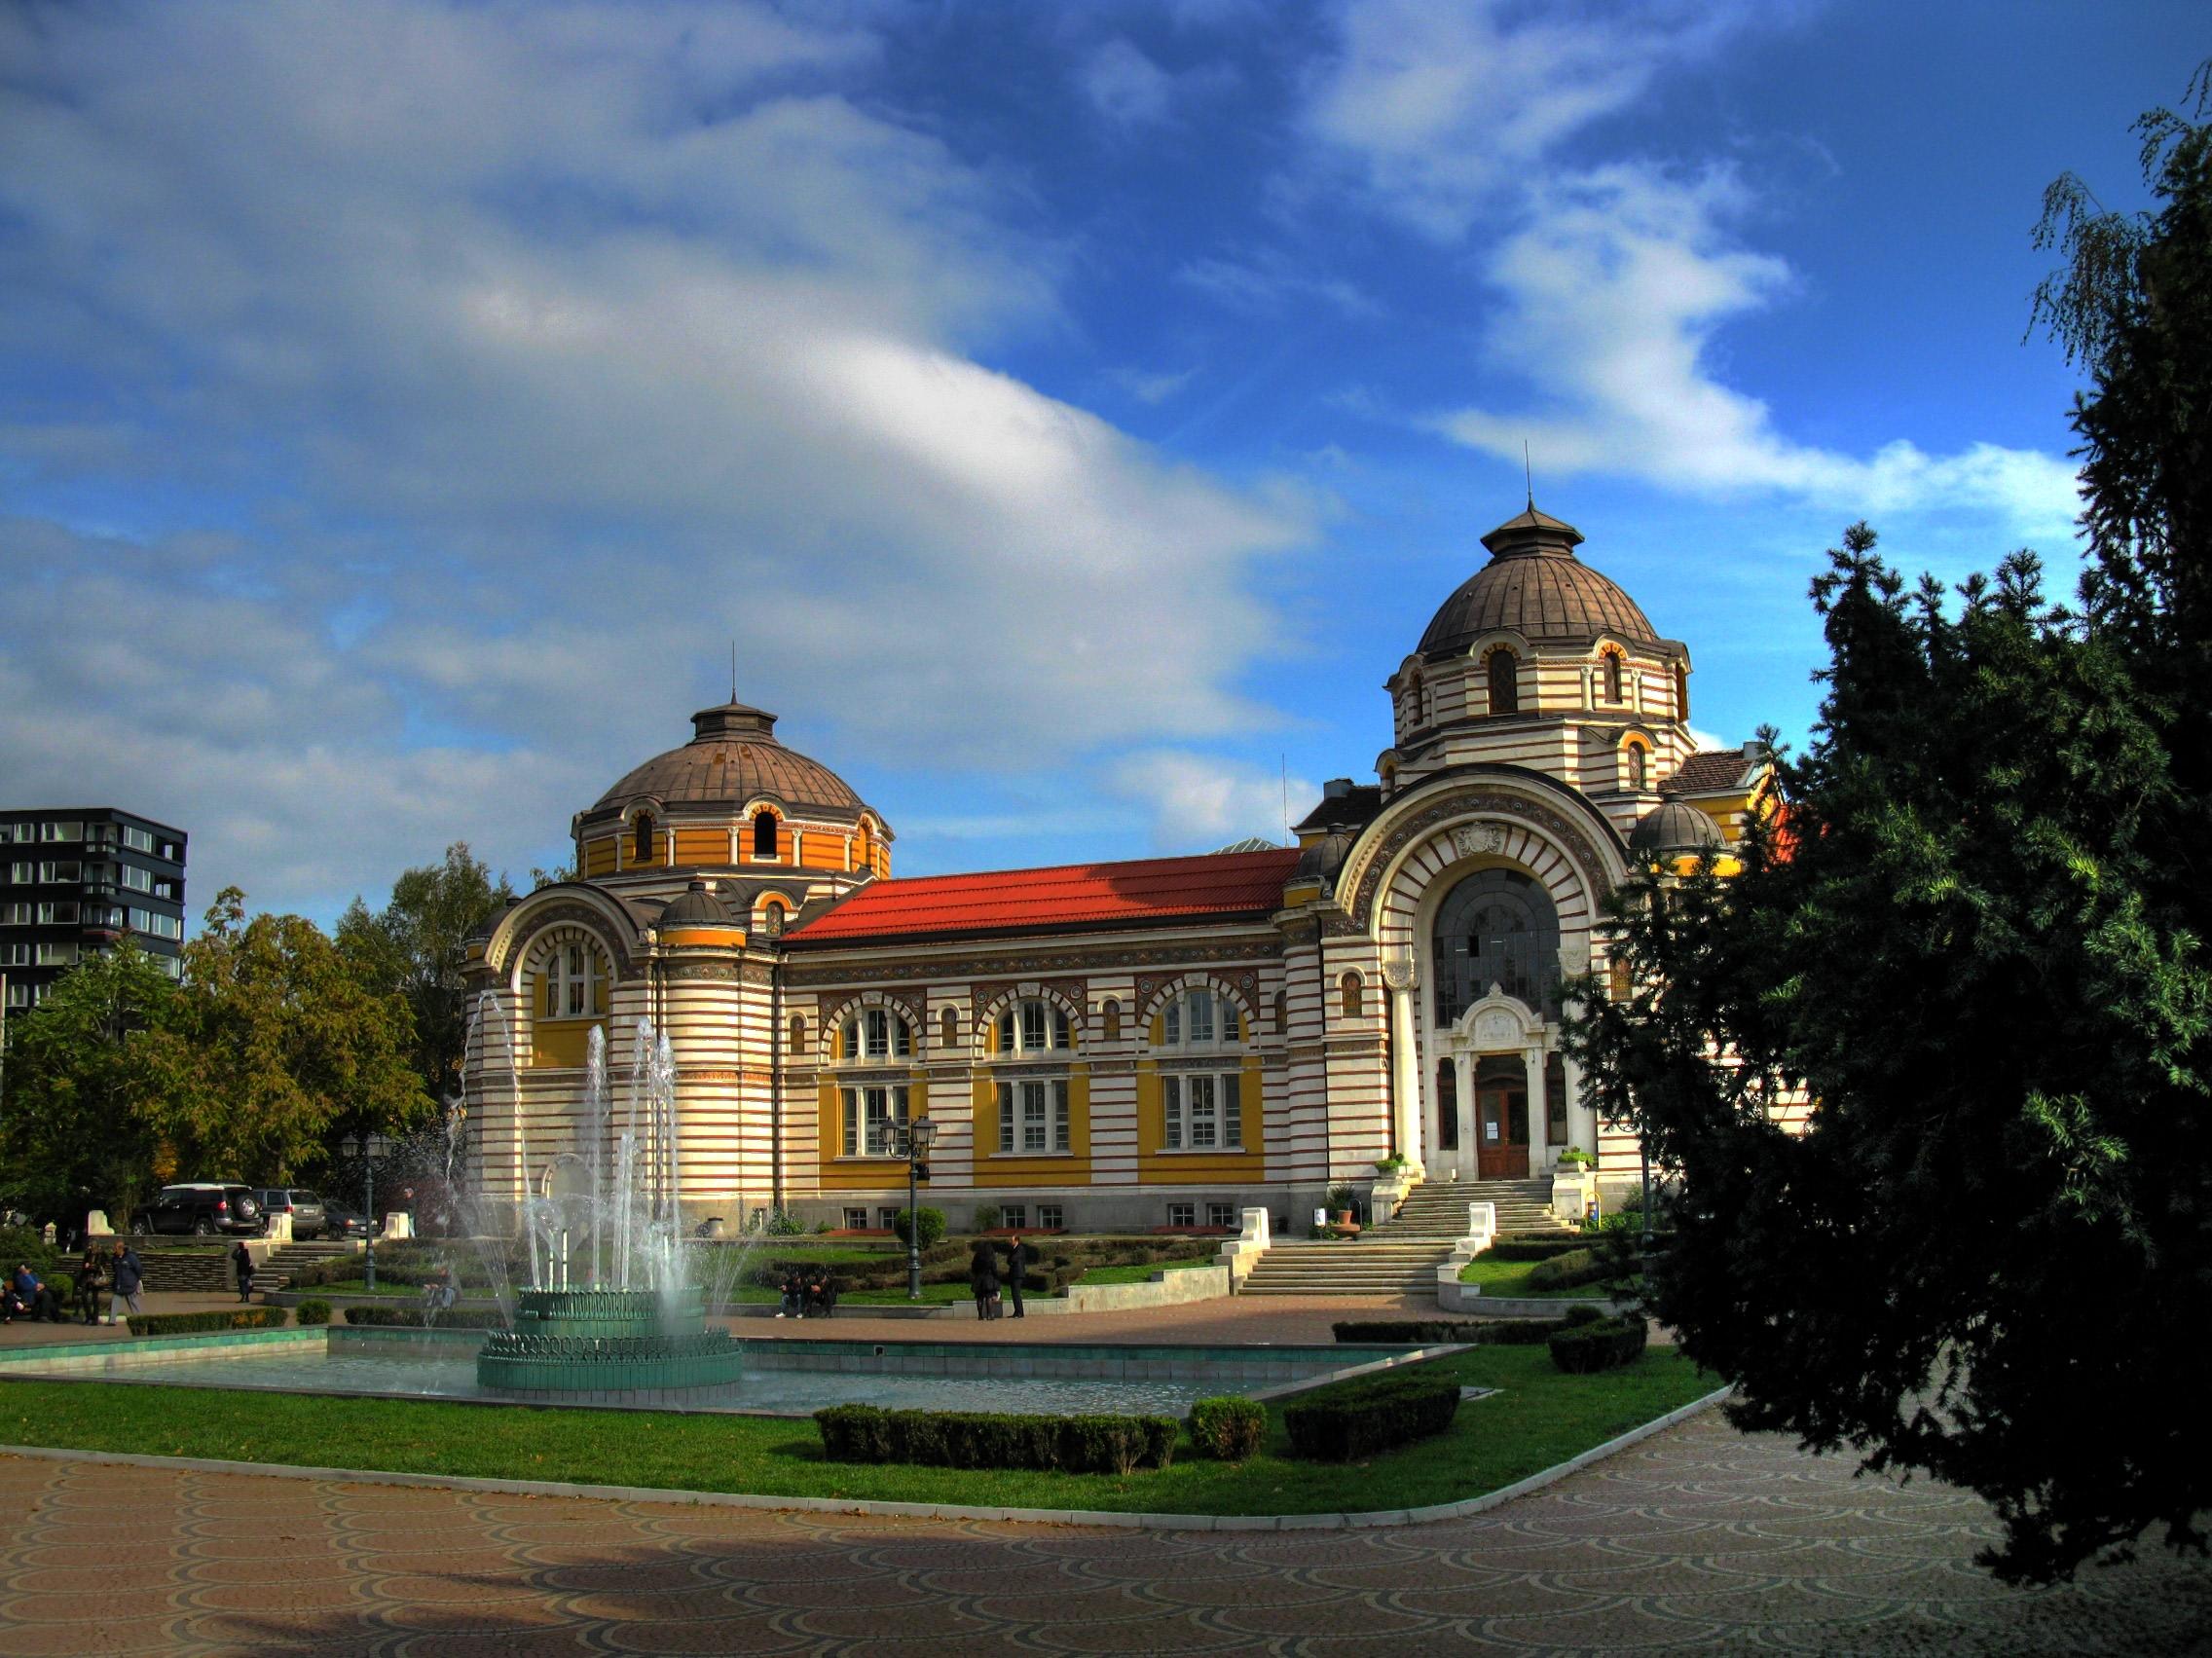 Sofia Central Mineral Baths